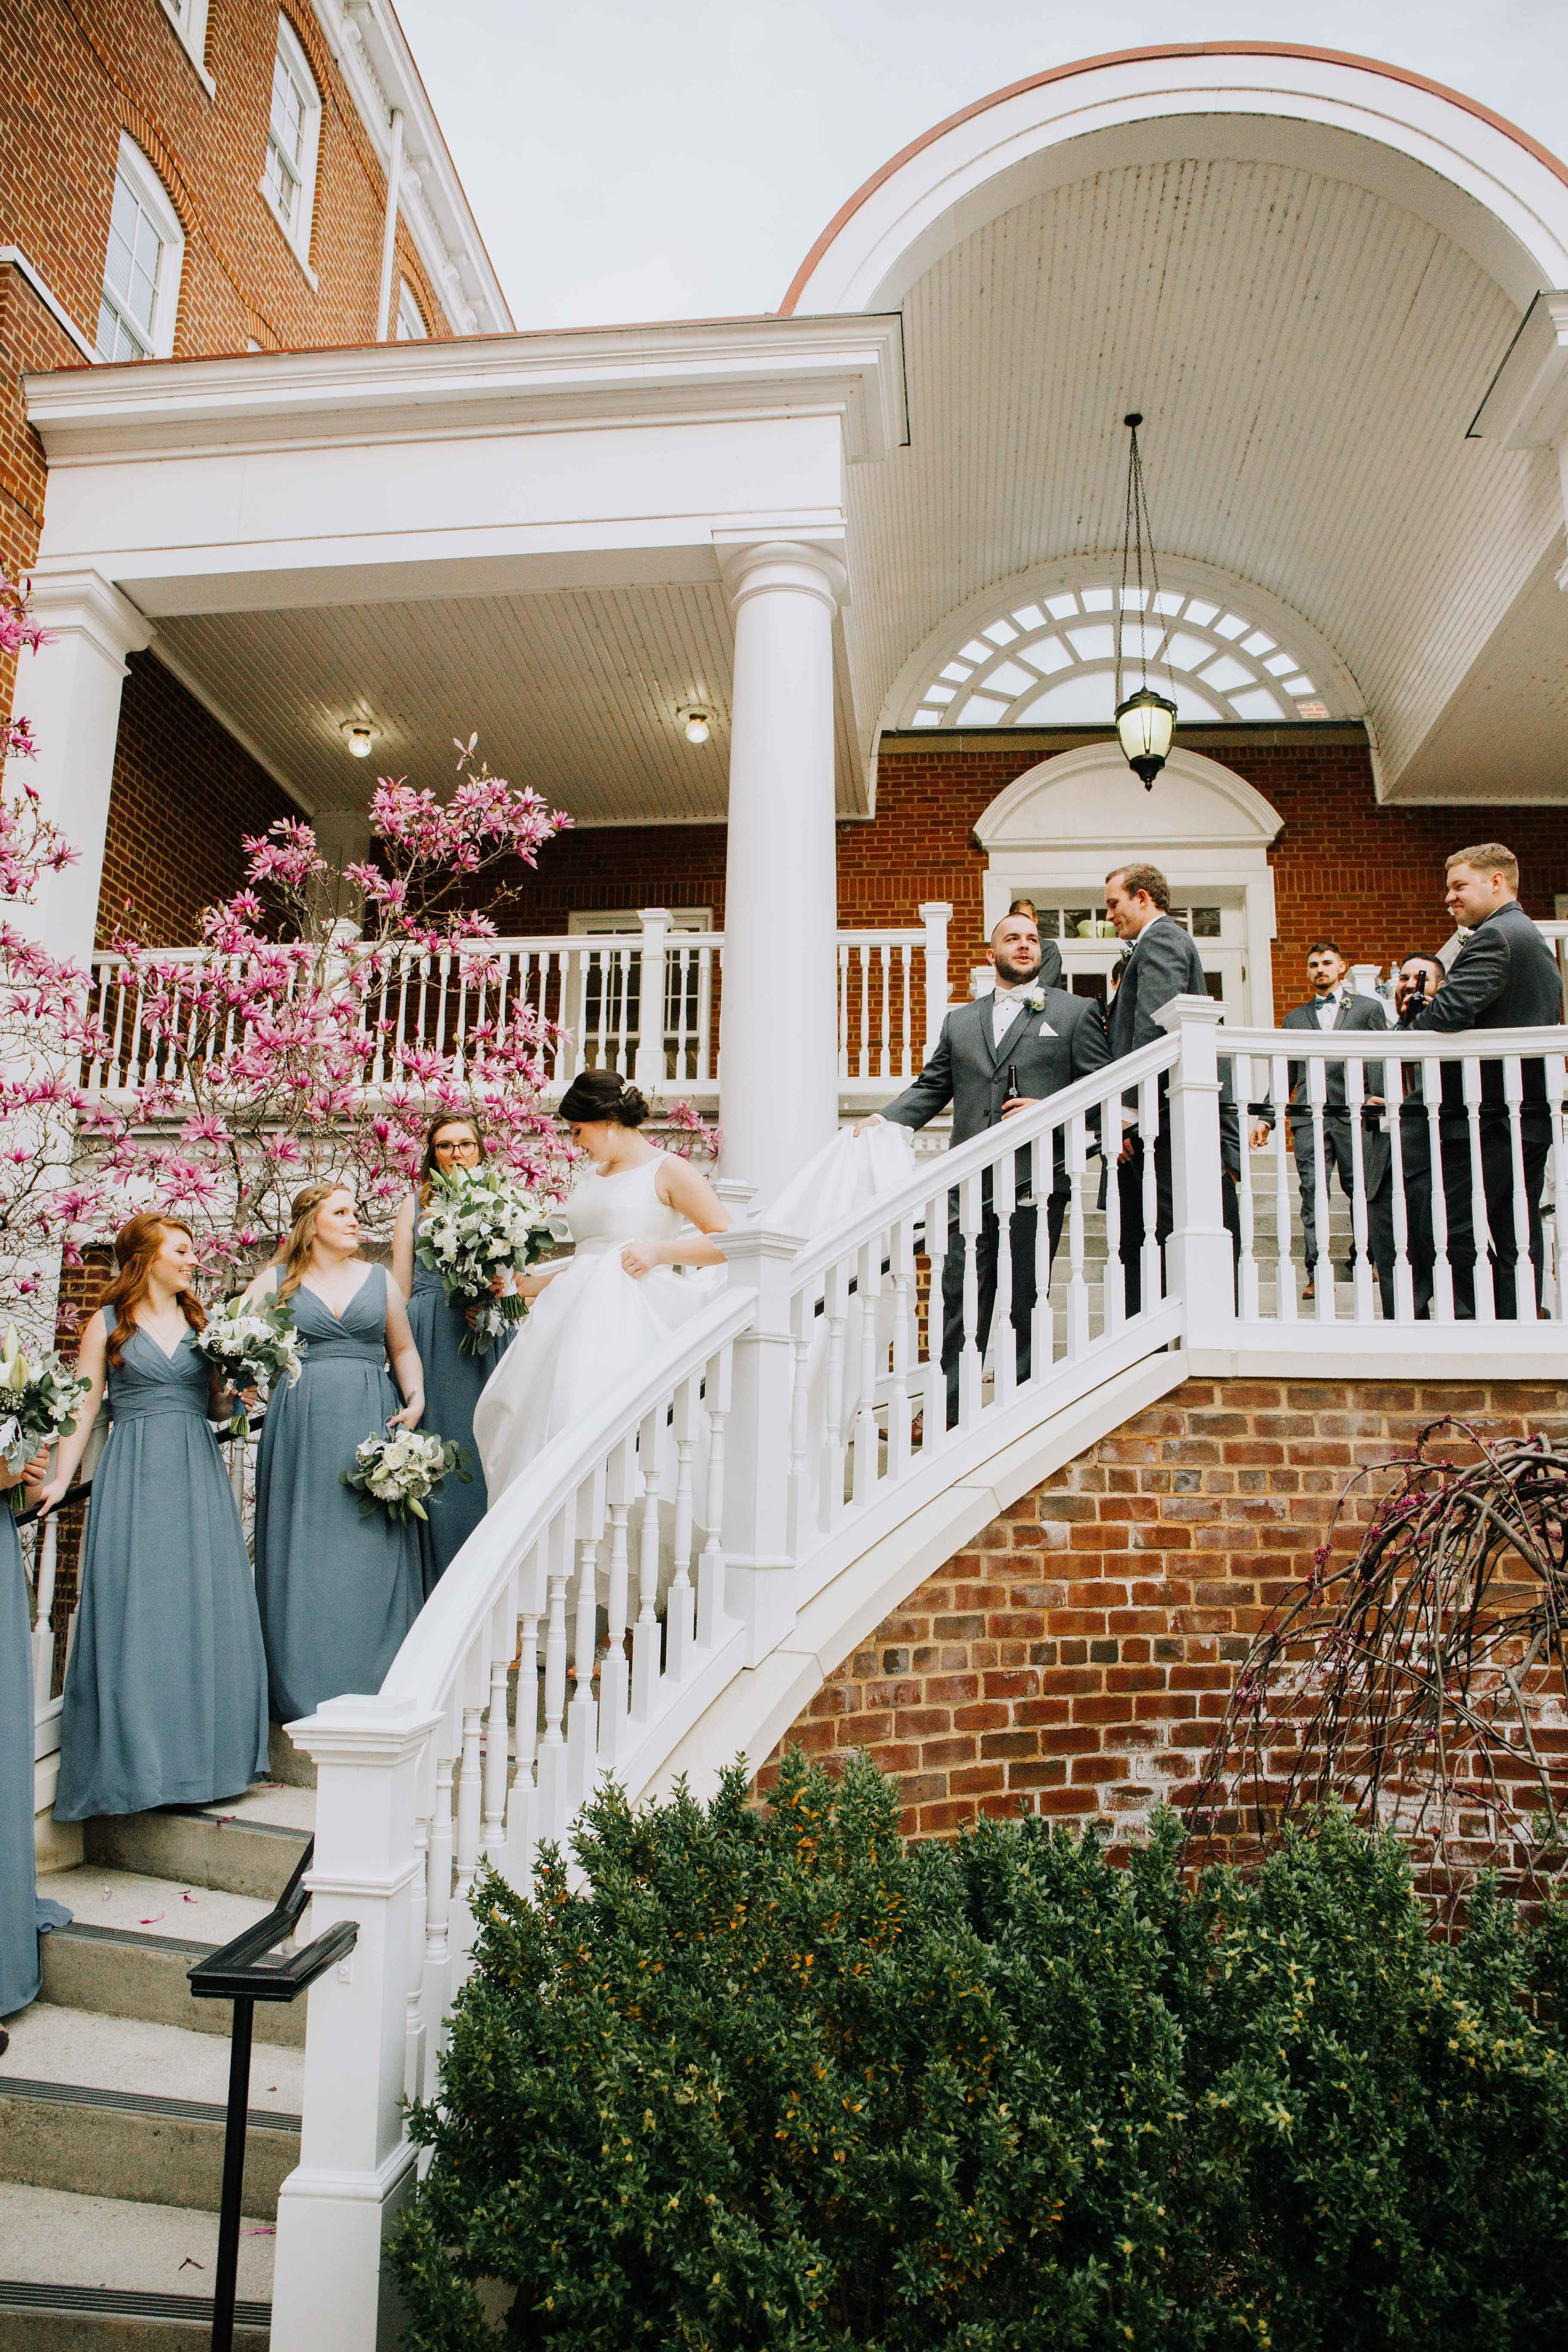 Farmville-Virginia-Wedding-Hotel-Weynoke-Downtown-Jacqueline-Waters-Photography-Detailed- (1119).jpg